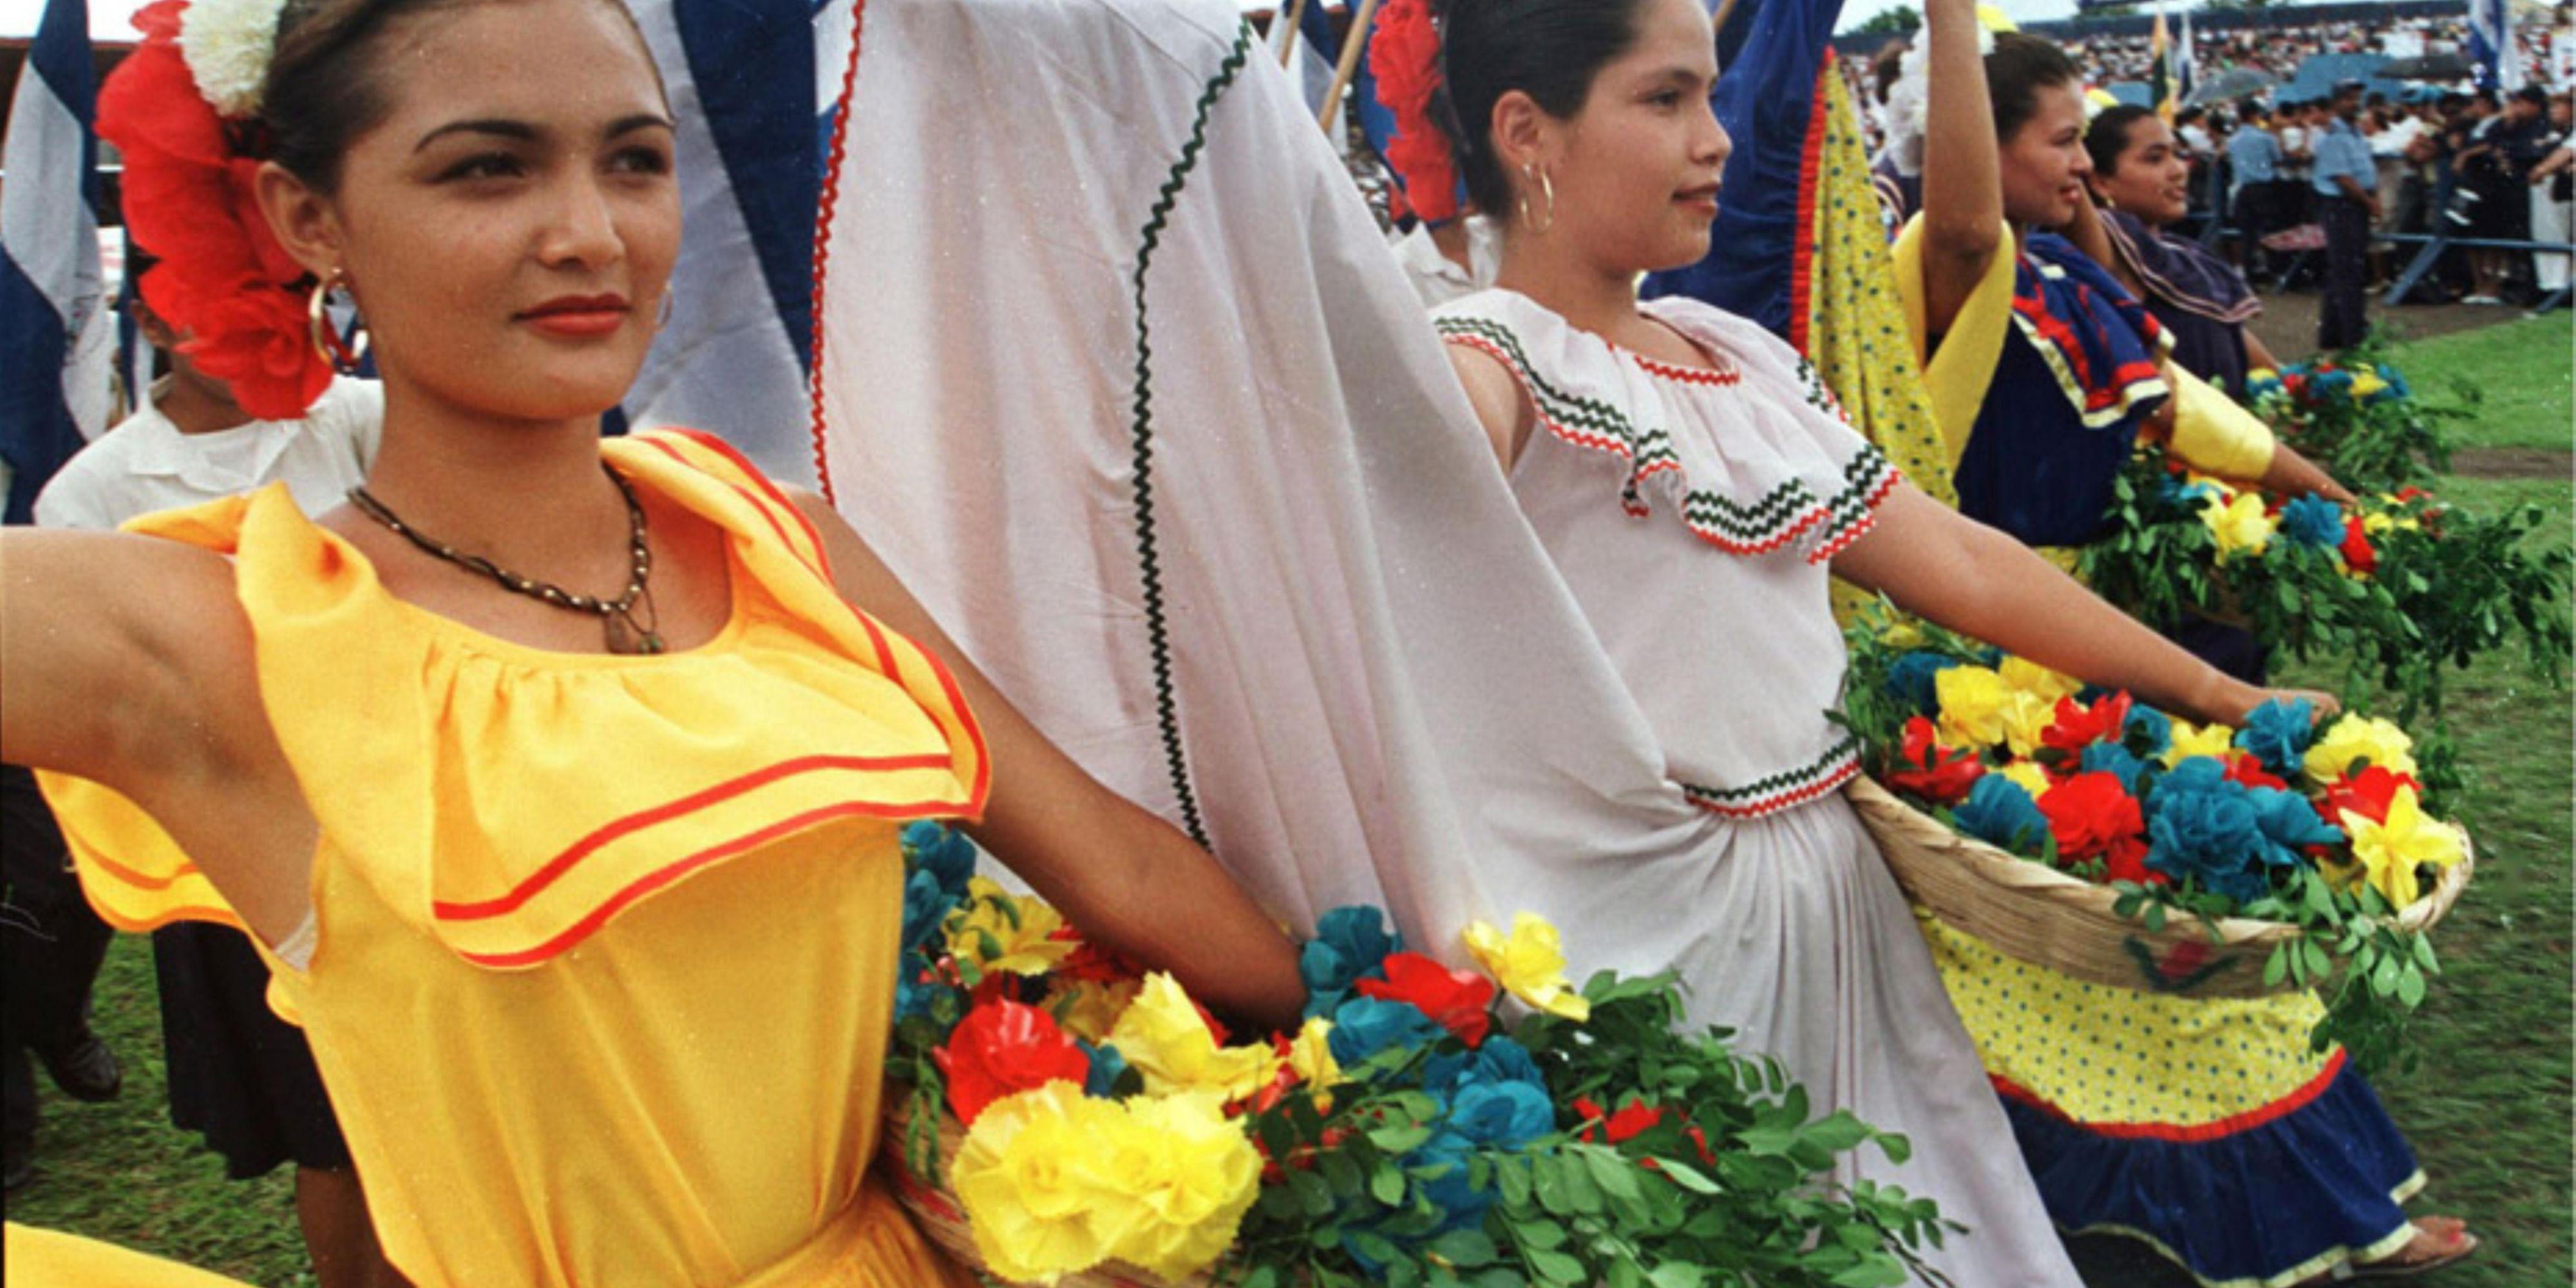 Teen girls in Managua